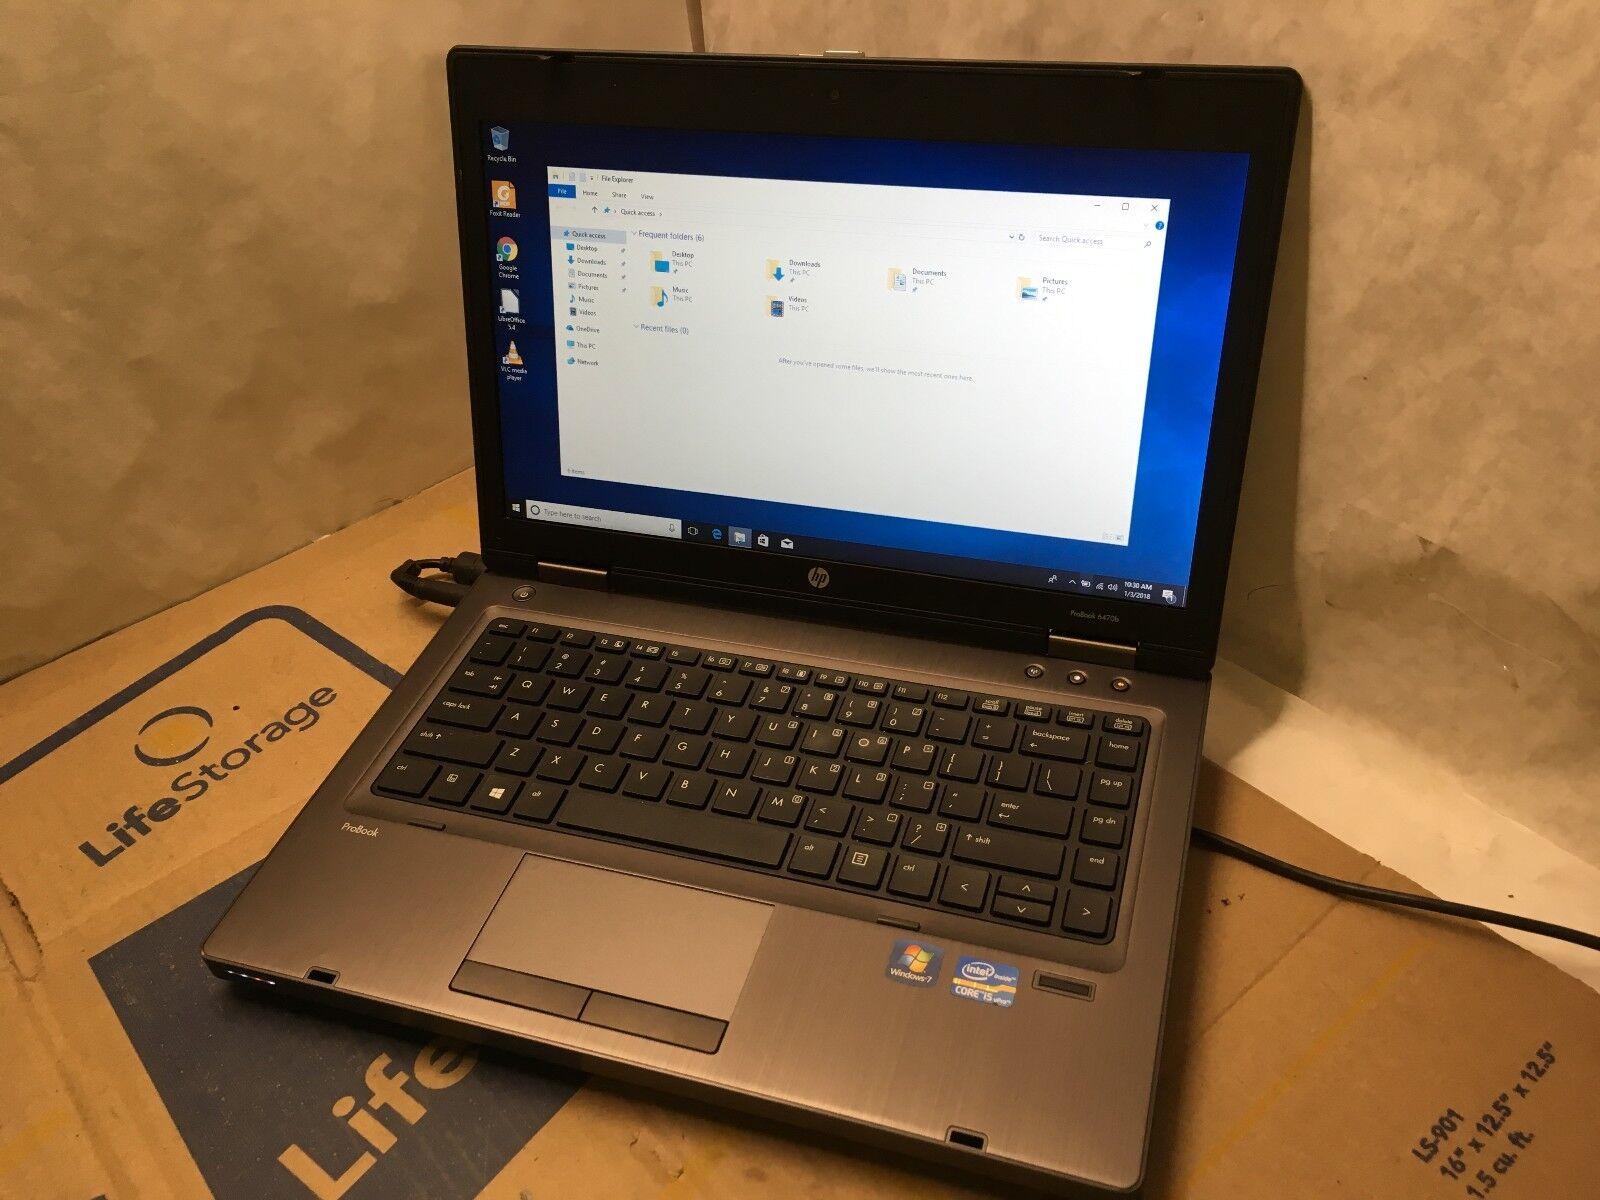 $179.00 - HP ProBook 6470B Laptop / 3rd Gen i5 2.5GHZ / 4GB / 250GB / Windows 10 / Webcam